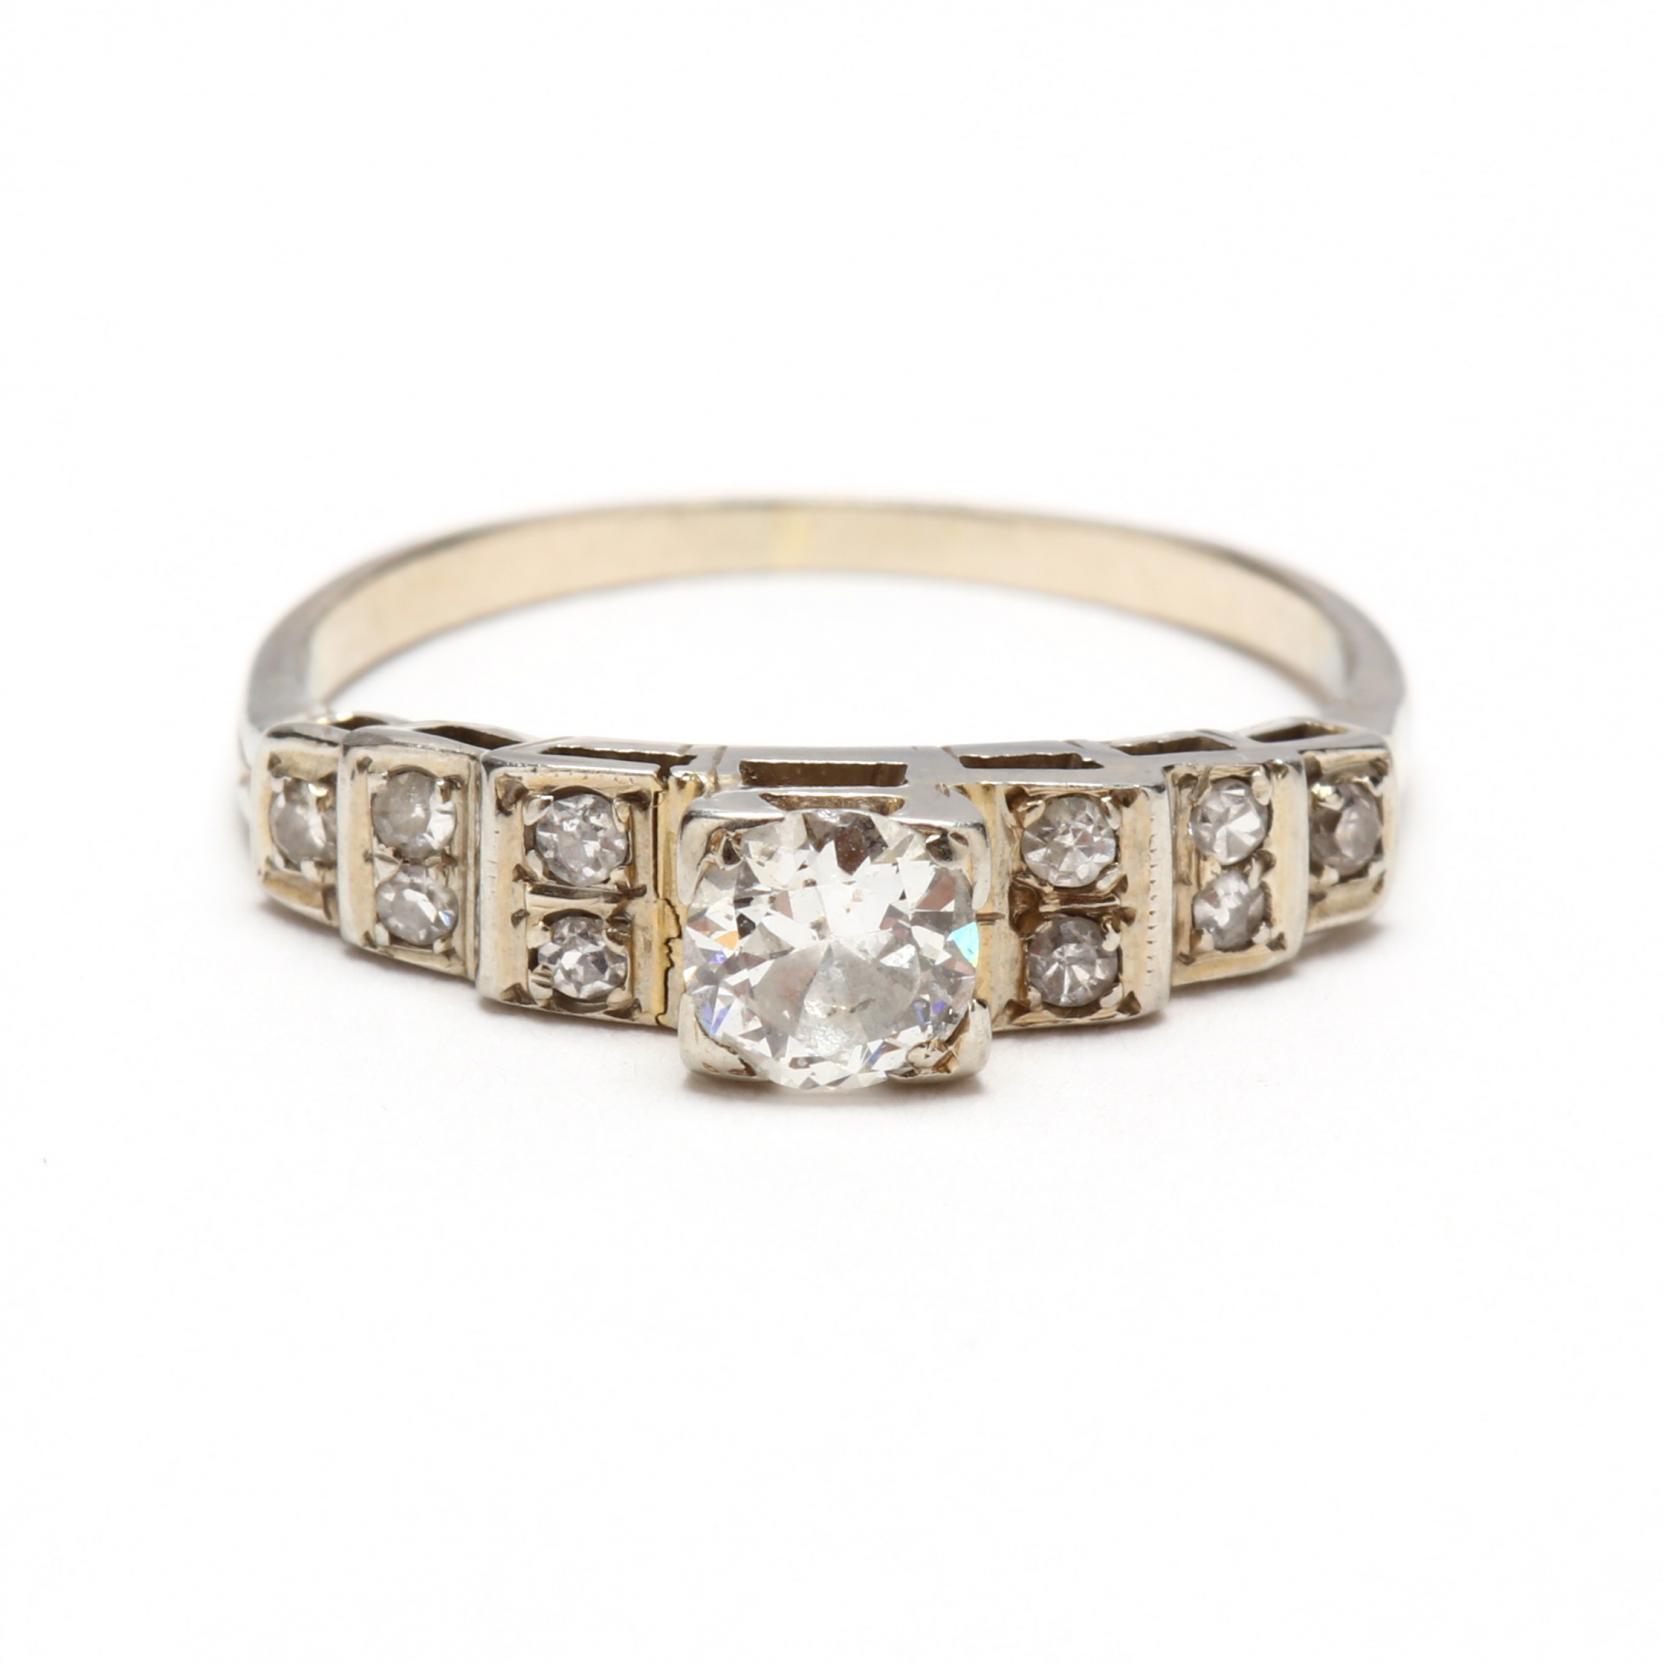 14kt-white-gold-and-diamond-wedding-ring